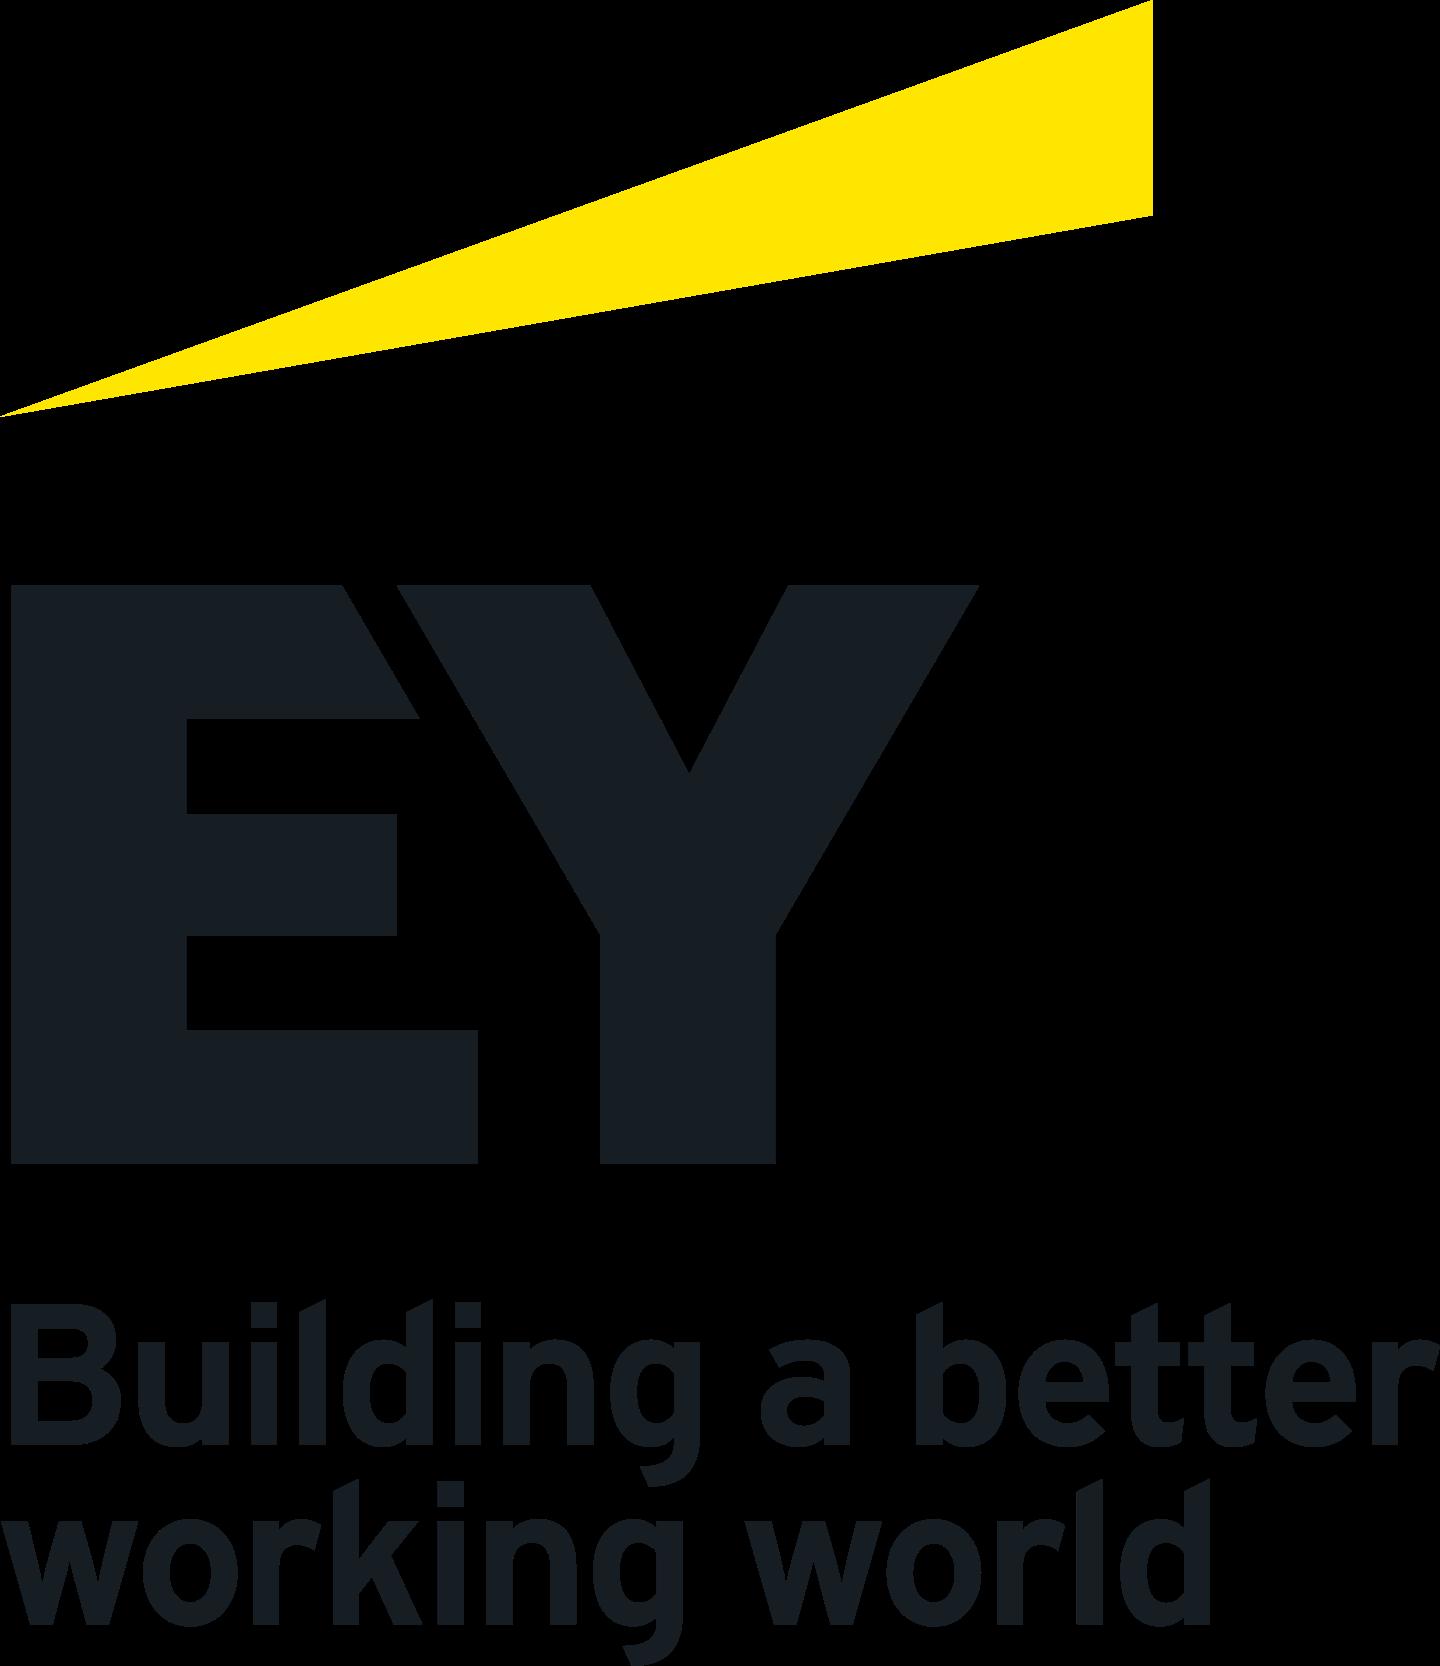 ernst young logo 5 - Ernst & Young Logo